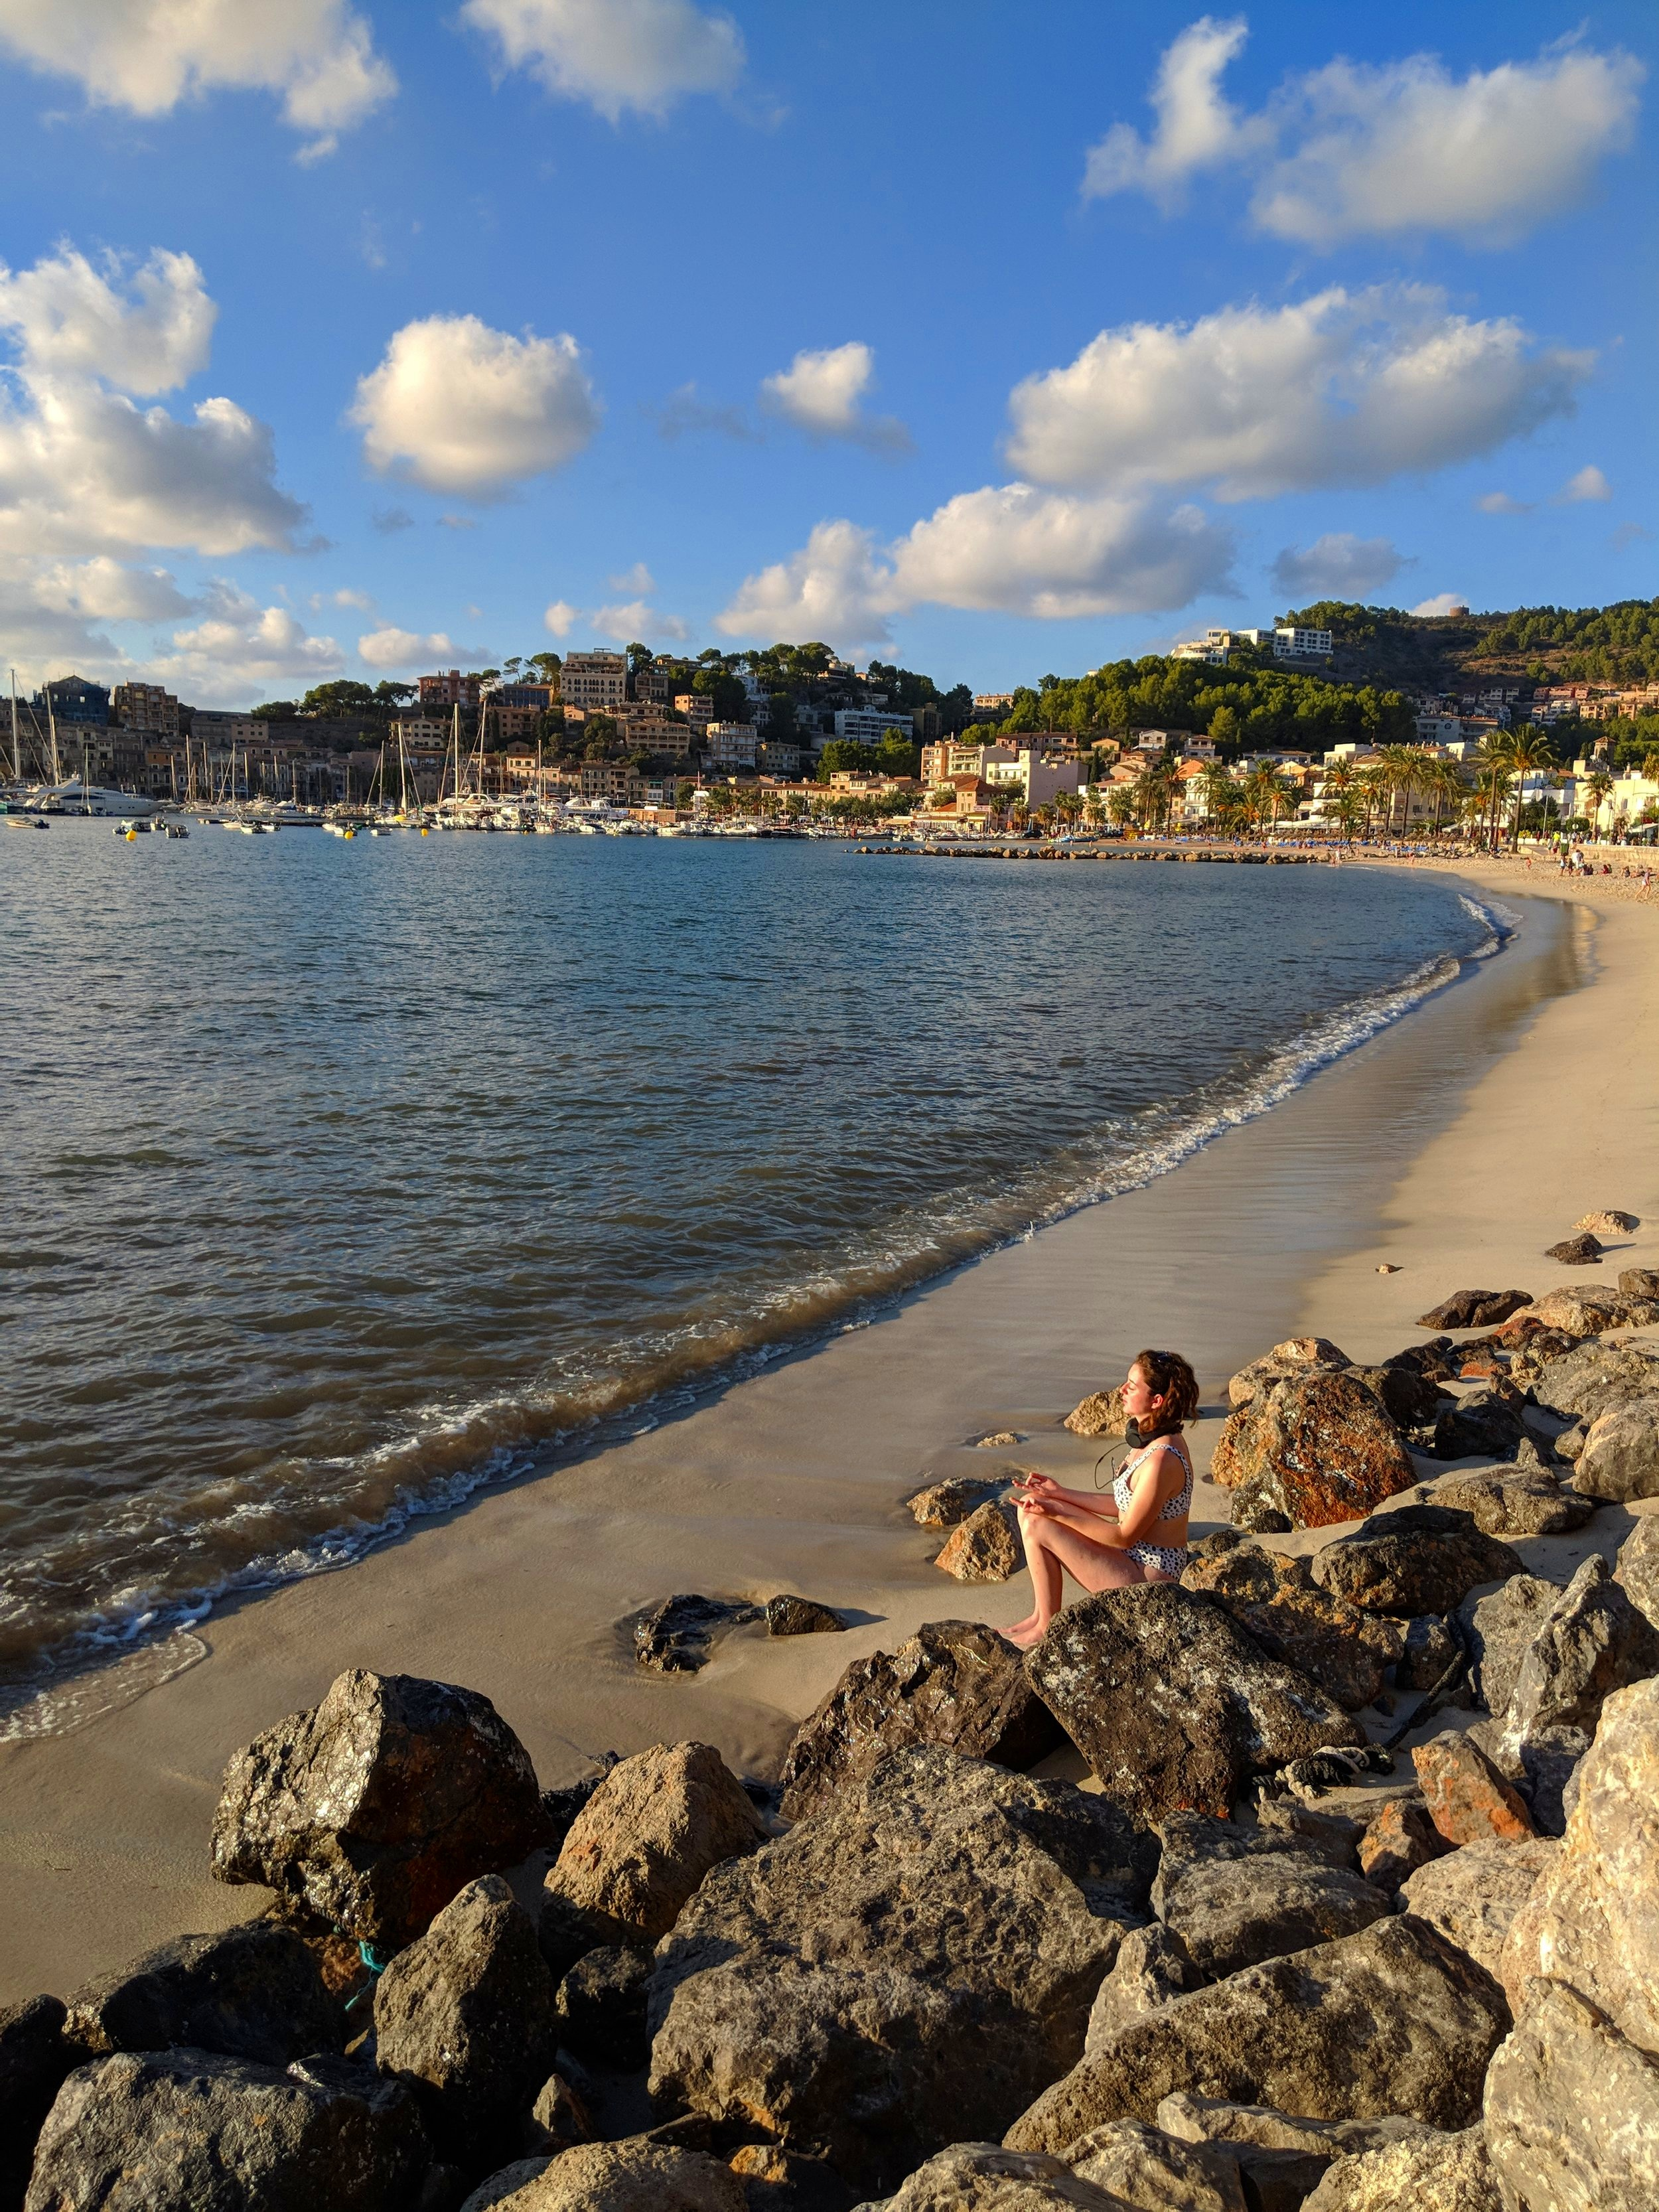 Mallorca: Port de Sóller trip, vegan travel review (with baby)